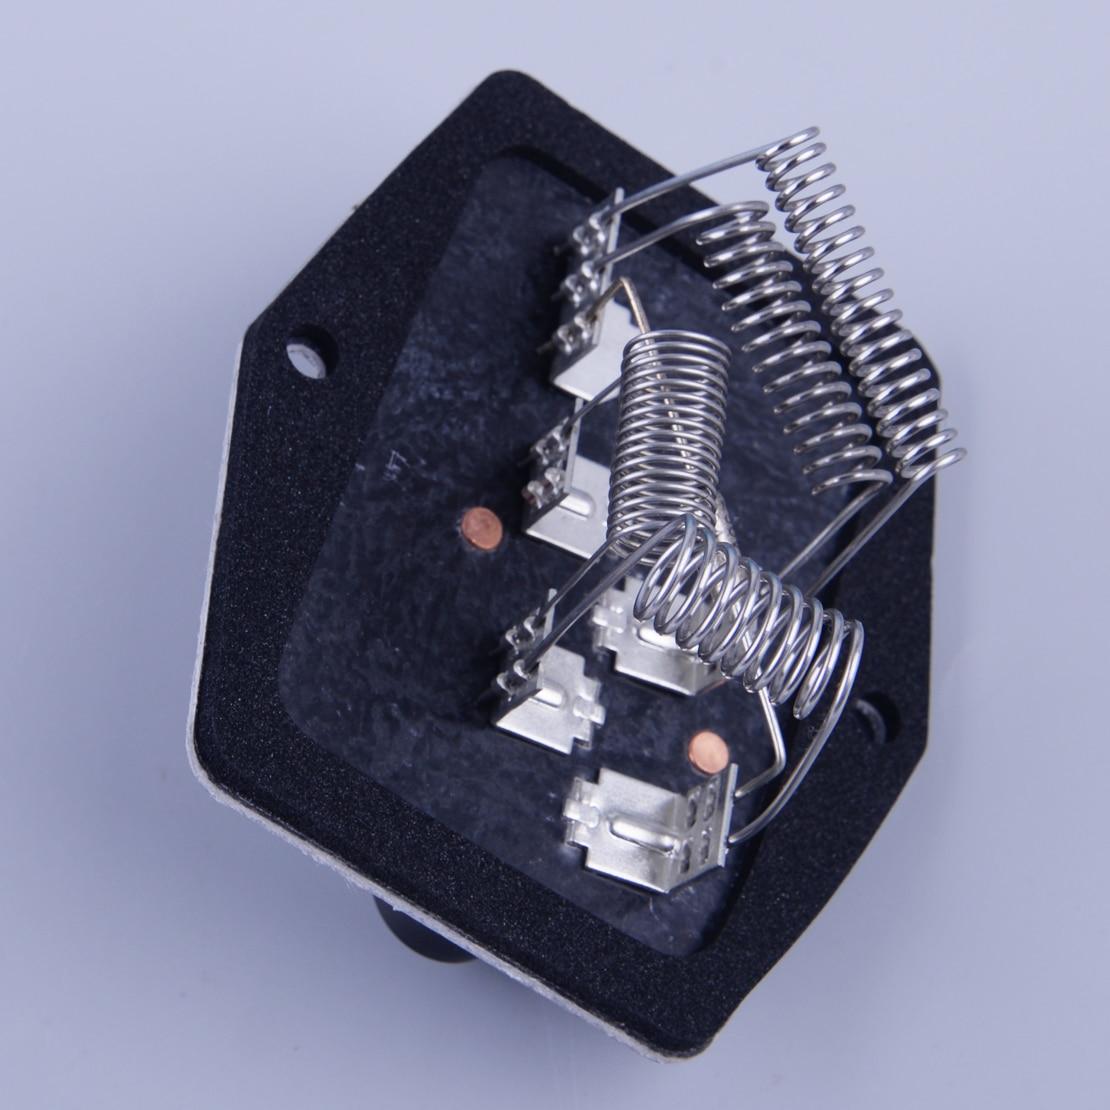 New AC Heater Blower Motor Resistor Fits Chevy GMC Pickup Truck 973-003 15024815